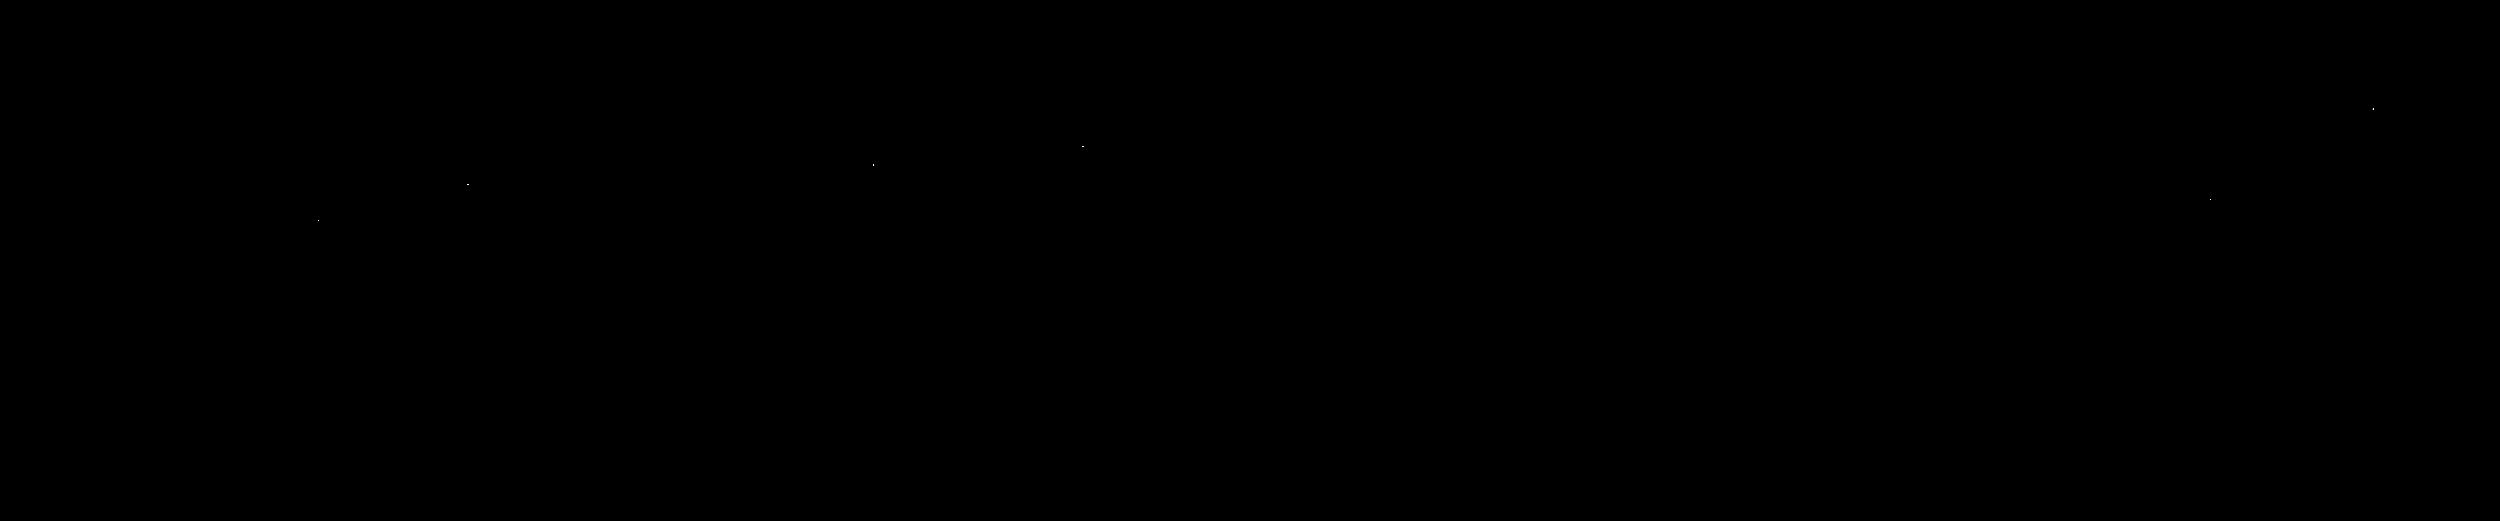 Mumsnet_logo.png